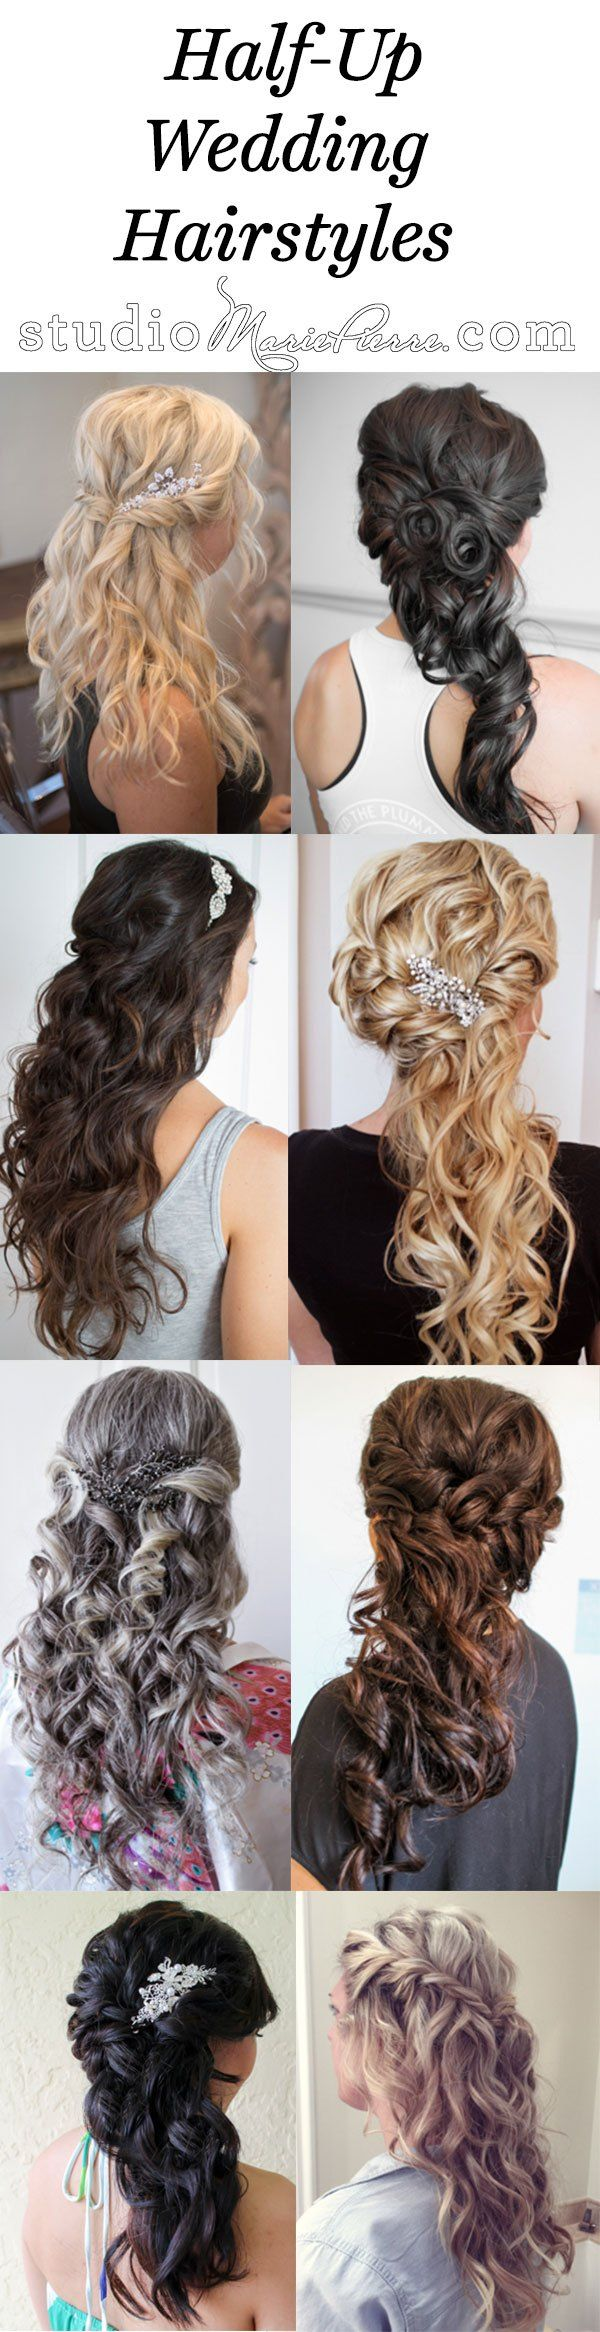 Gorgeous halfup halfdown wedding hairstyles